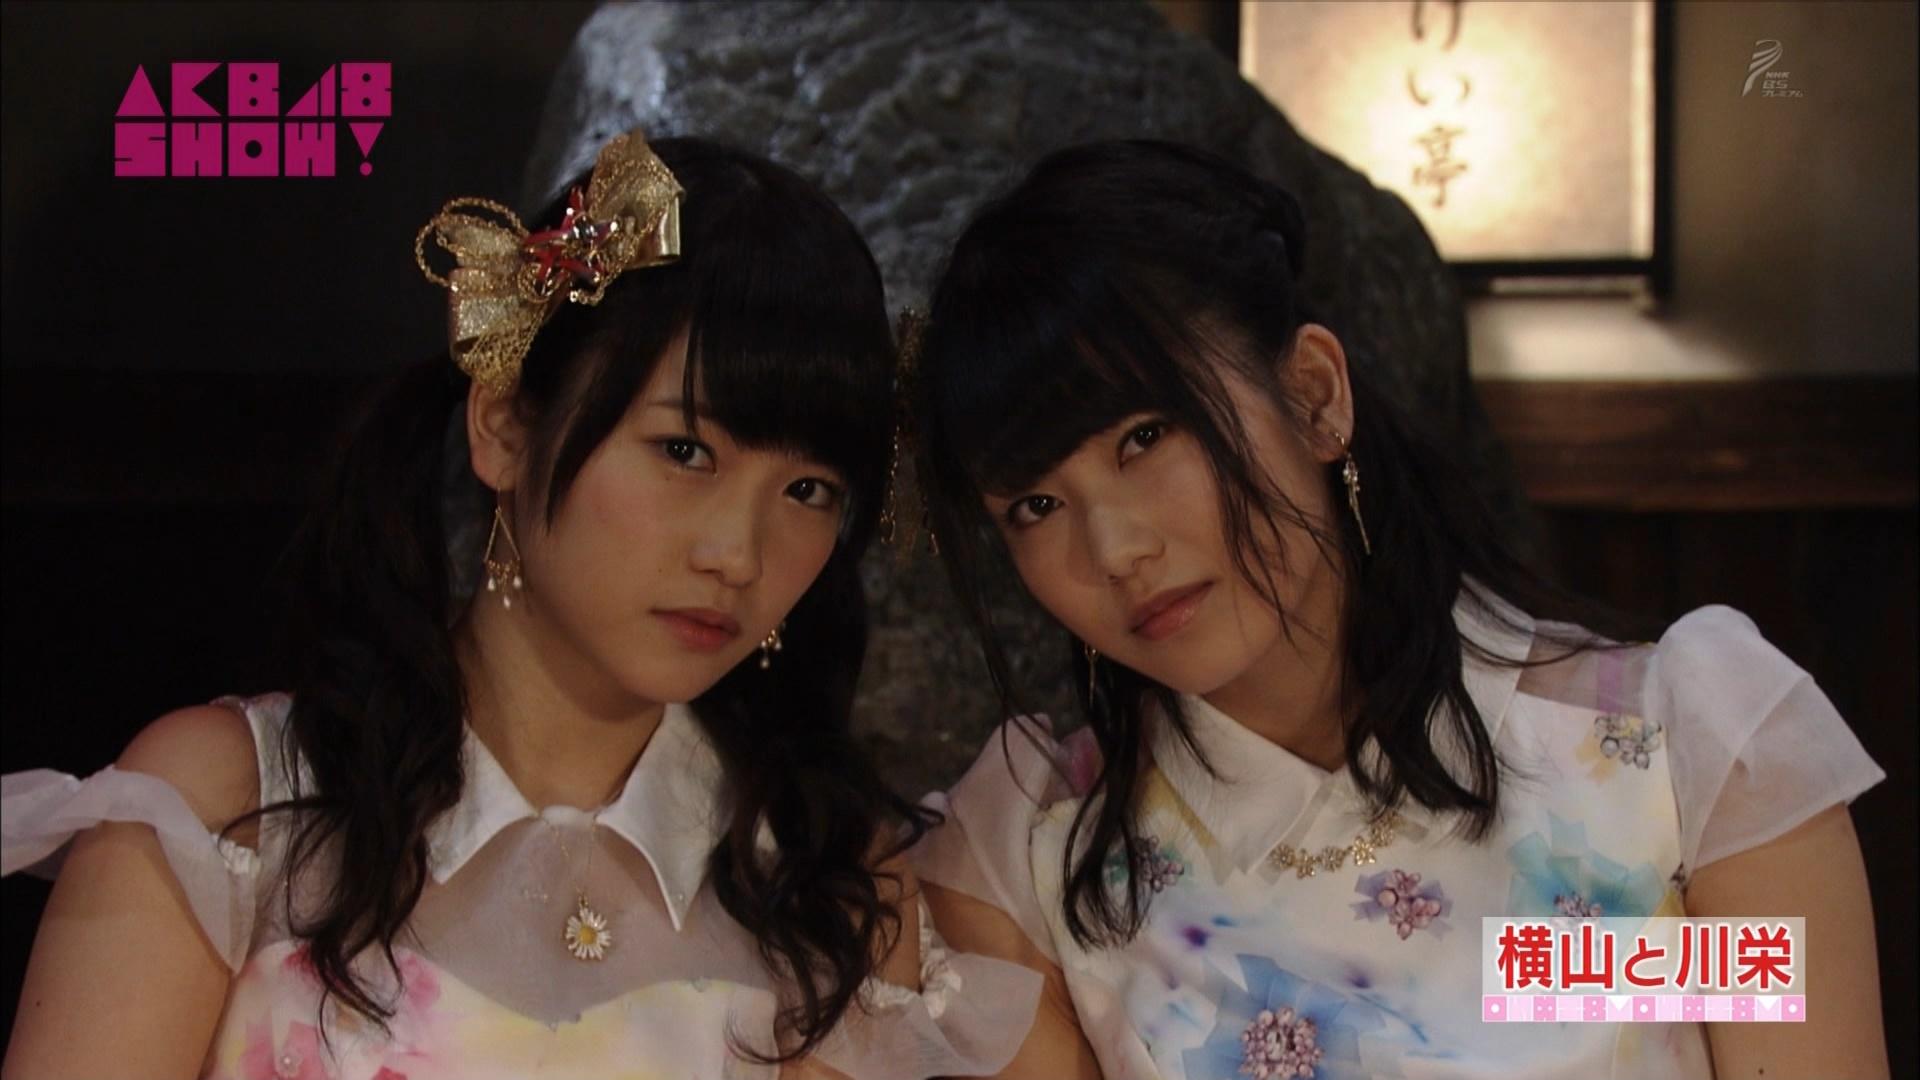 横山由依と川栄李奈 AKB48SHOW! 20140906 (40)